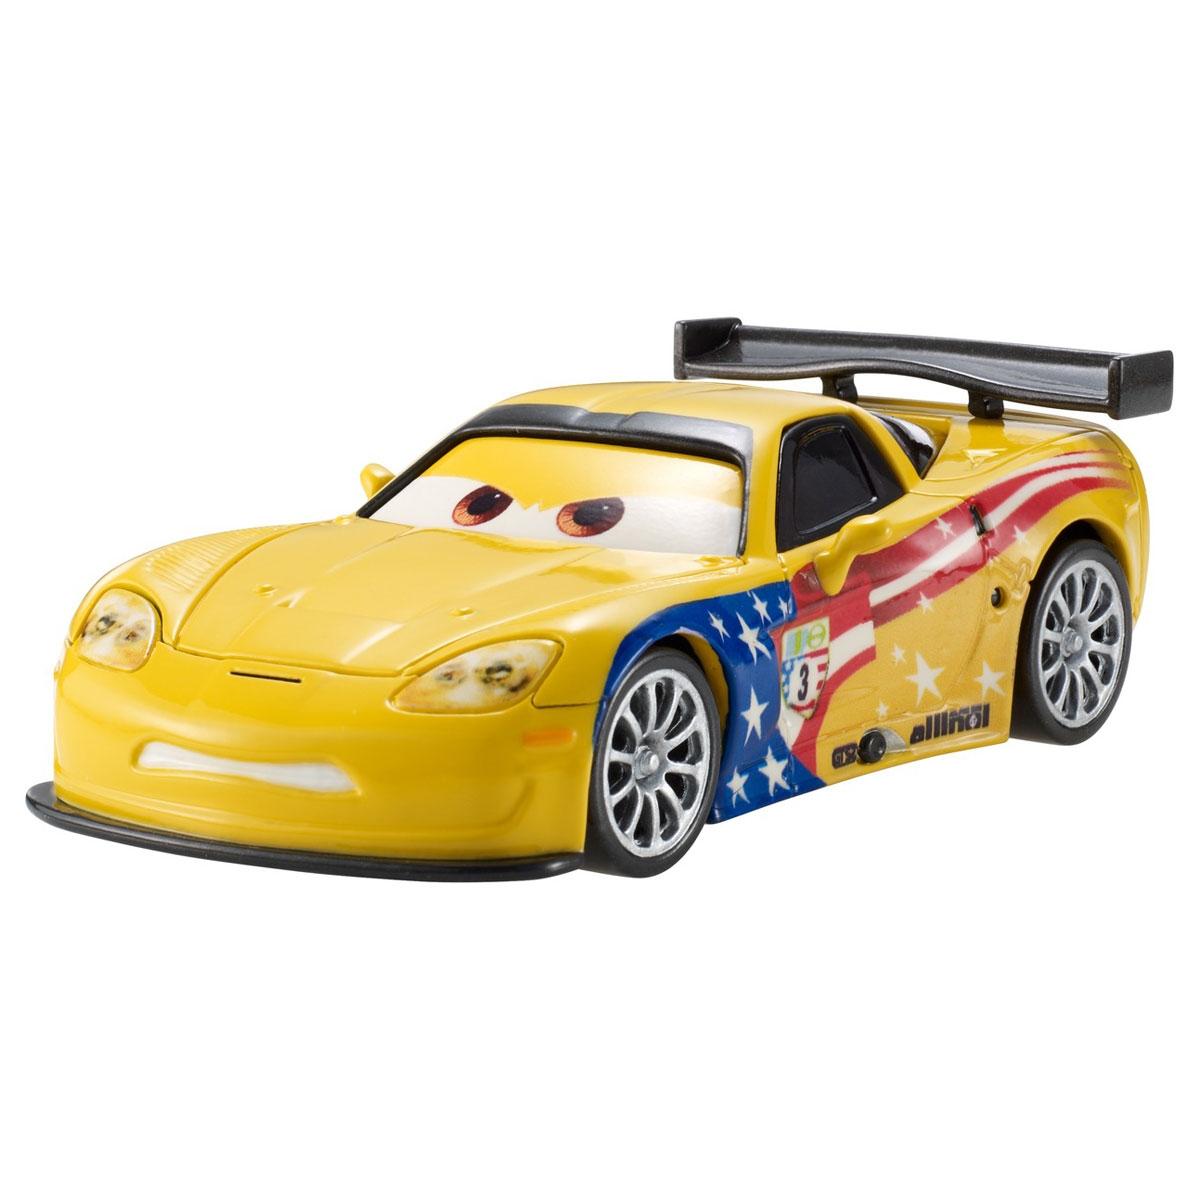 Disney cars charakter w die cast spielzeugauto